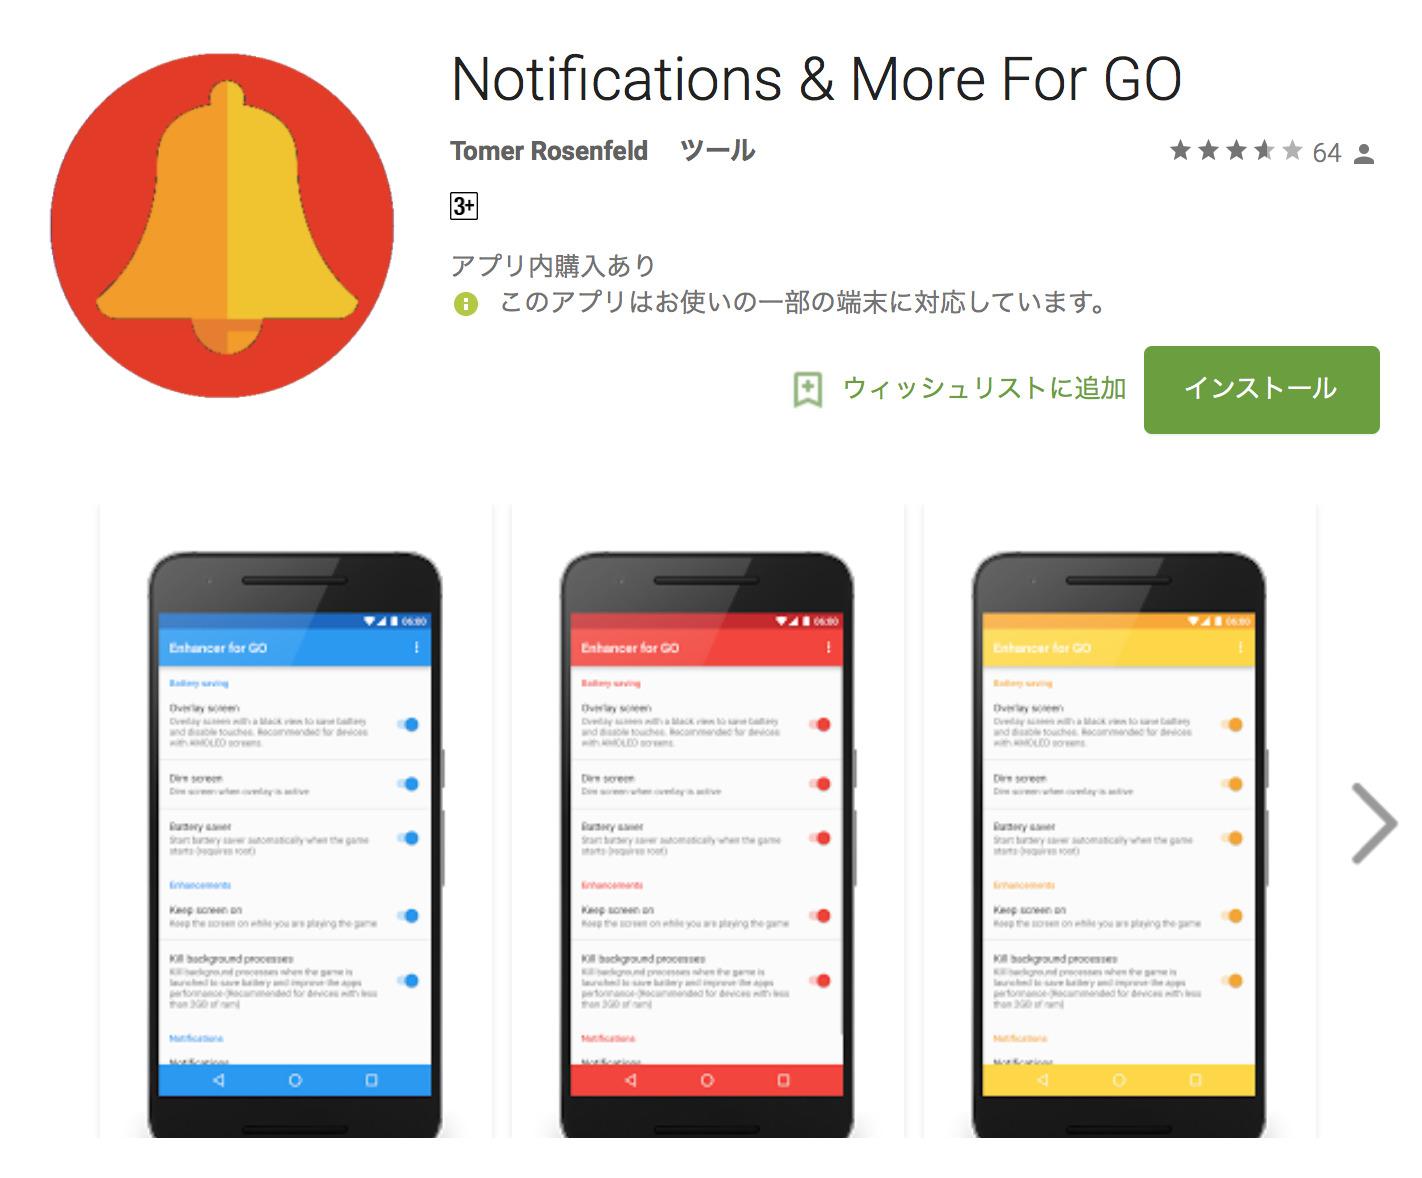 pokemon-go-plus-release-date-postponed-00002